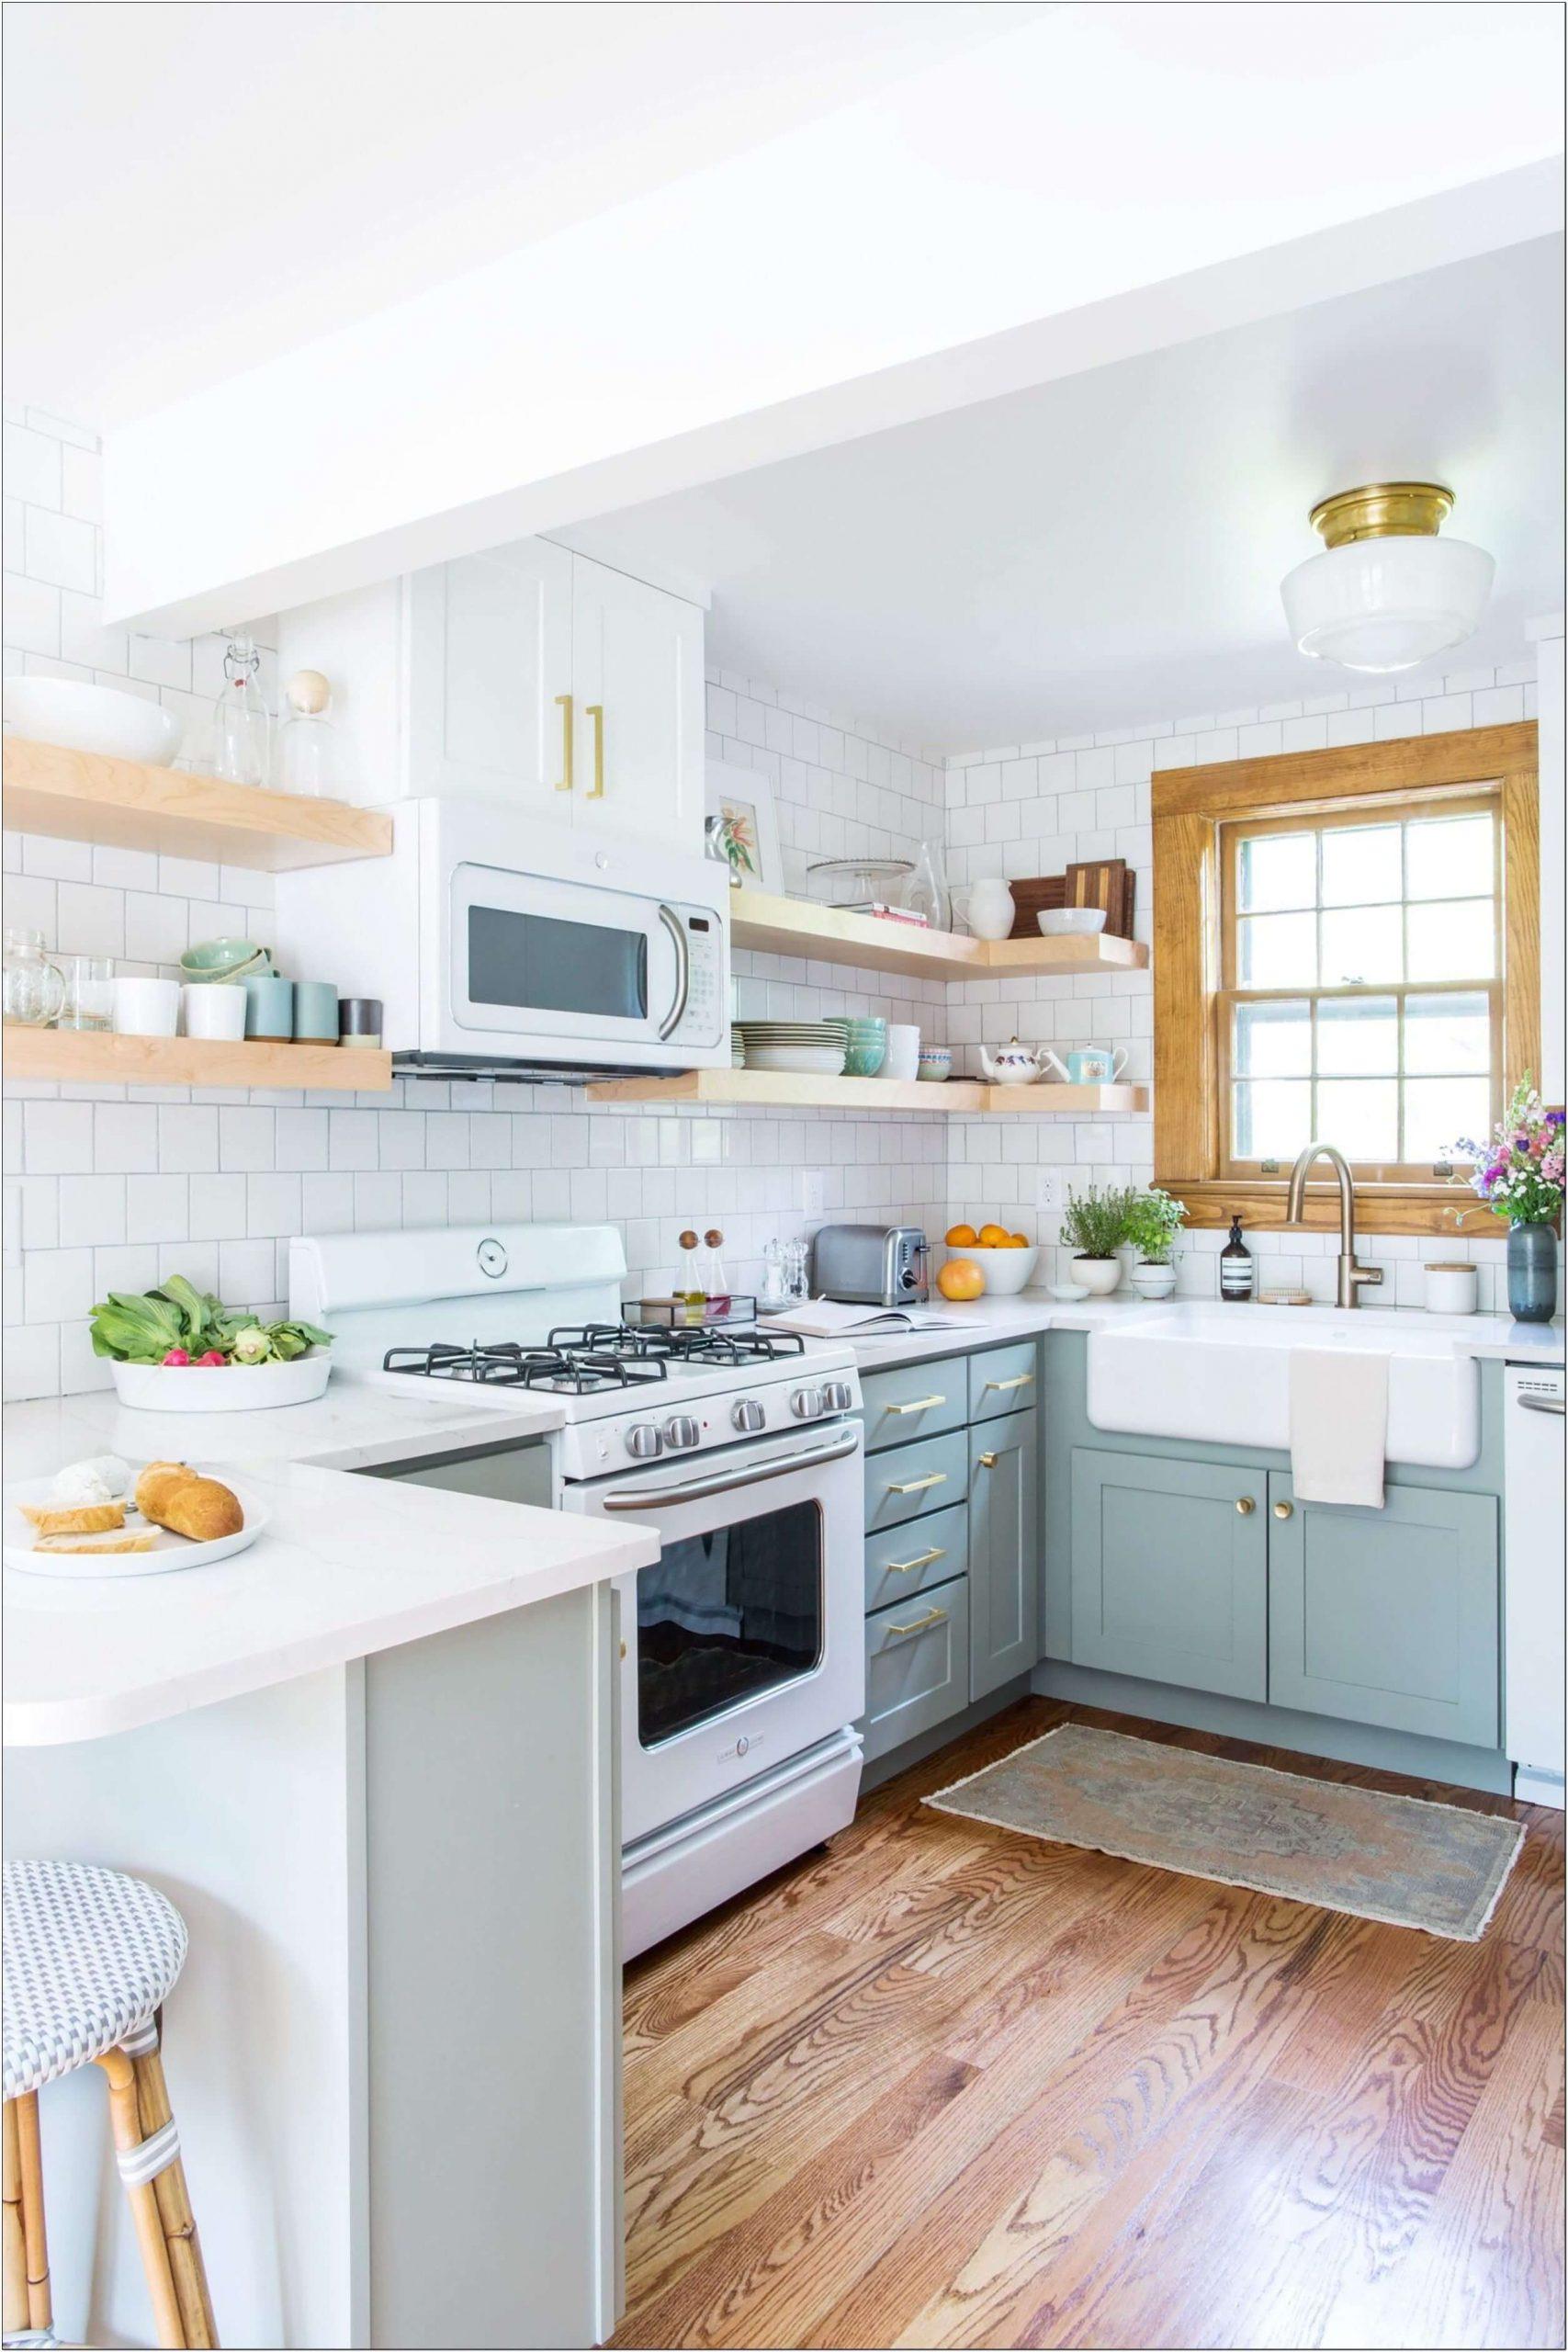 9 Best Light Blue Kitchen Design and Decor Ideas for 209